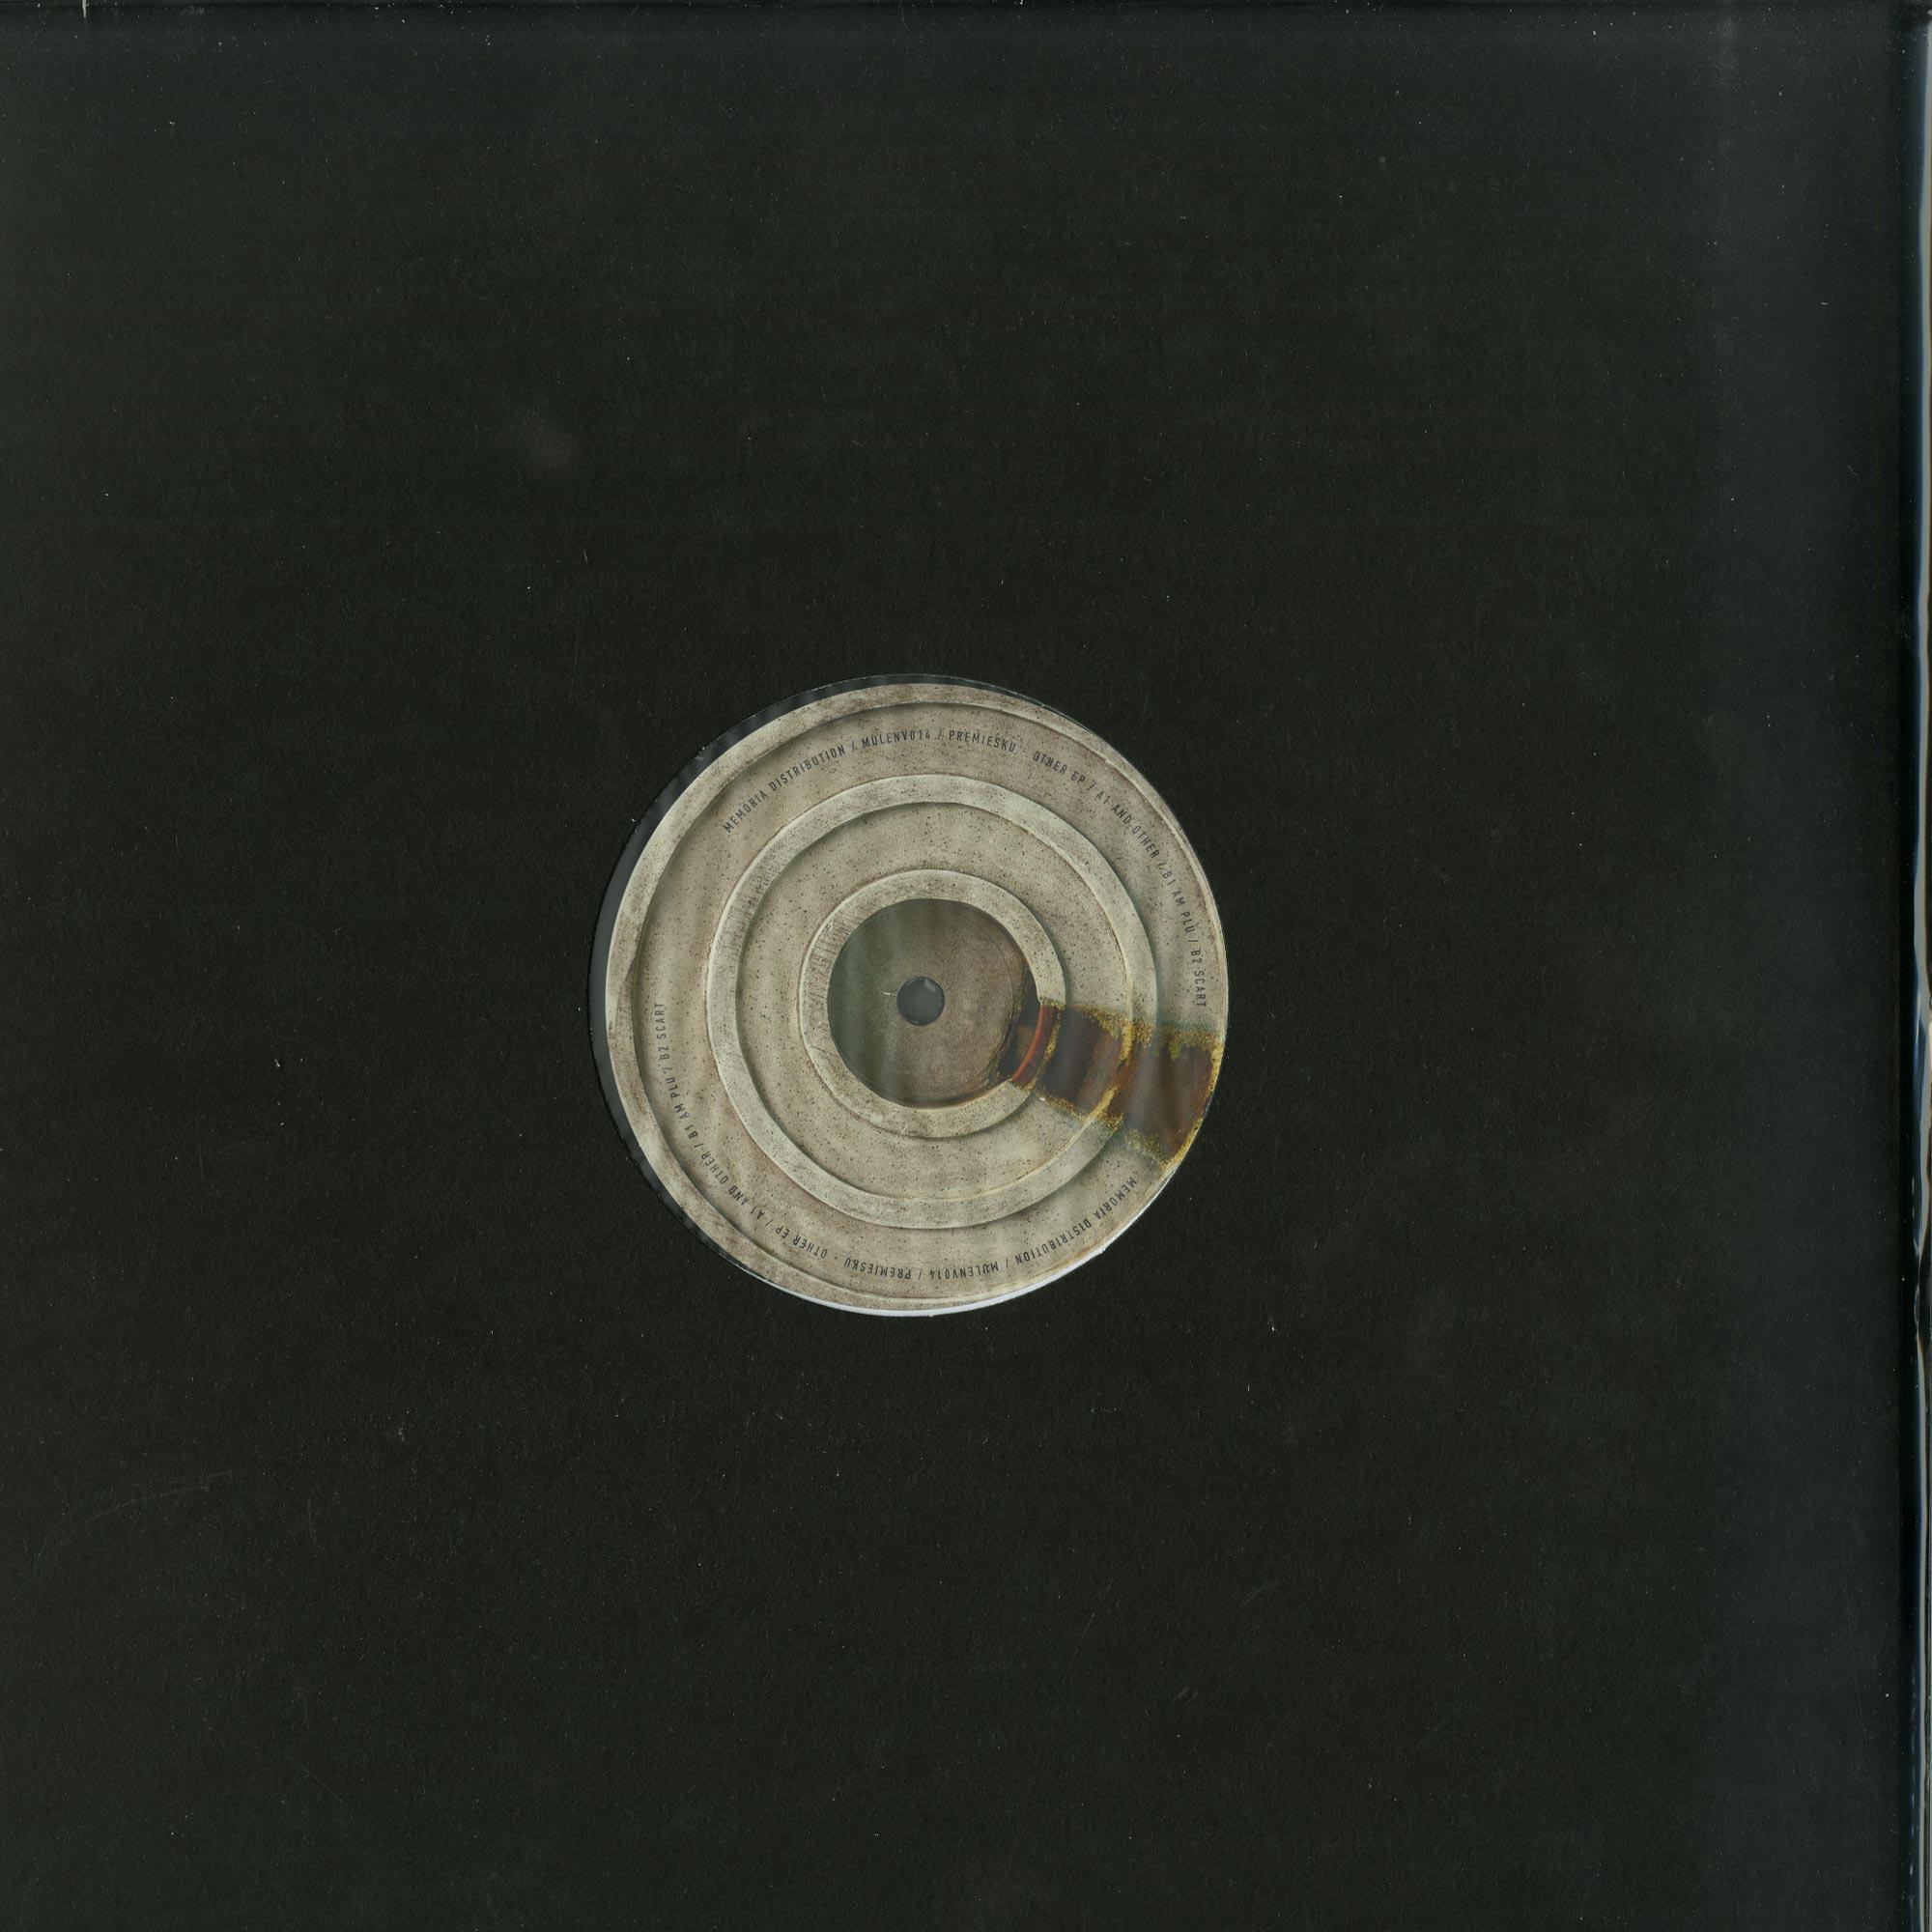 Premiesku - OTHER EP